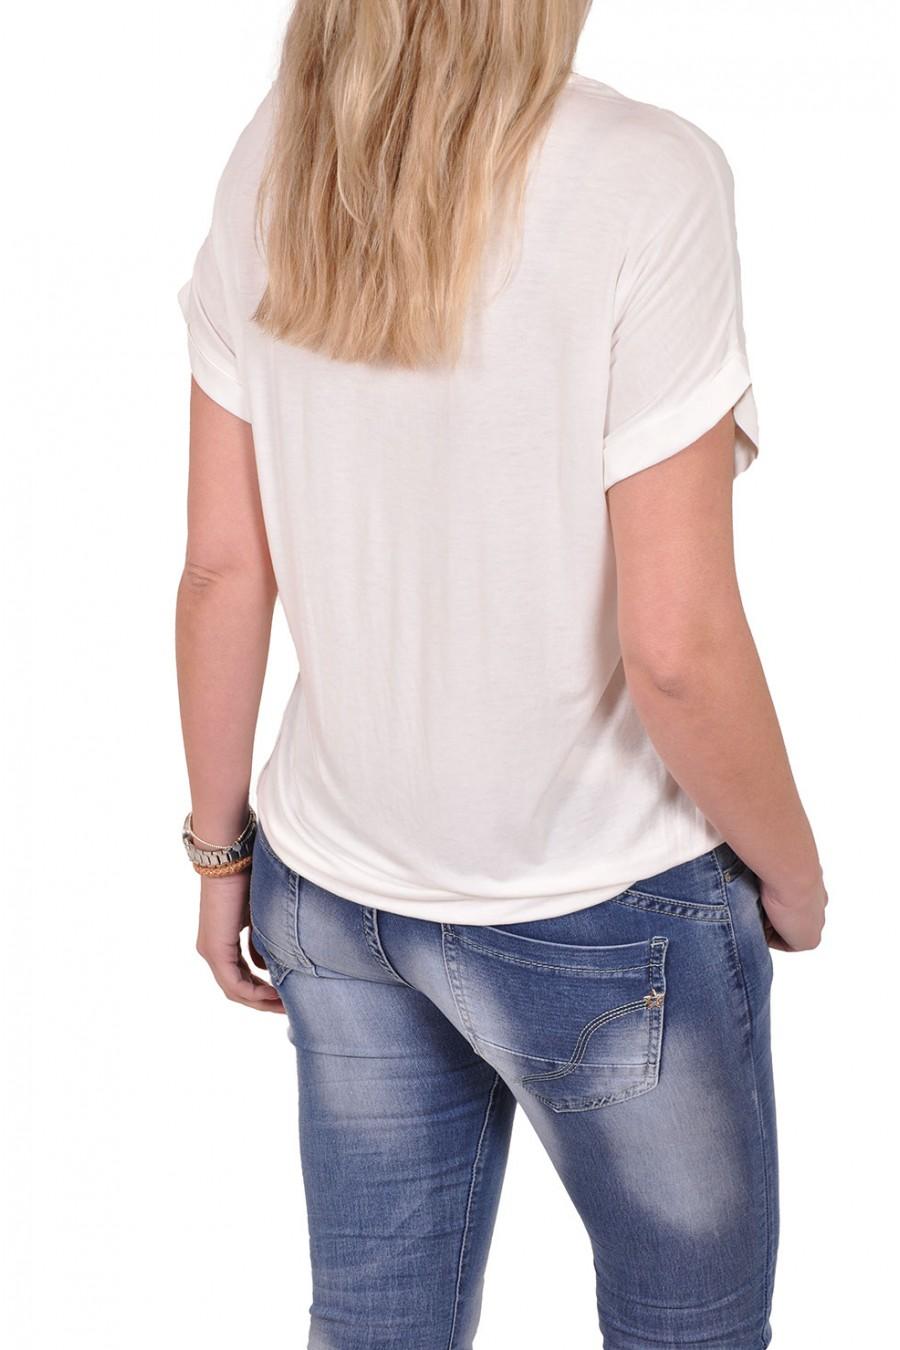 Silk touch v-hals top Gemma Ricceri off white Gemma Ricceri